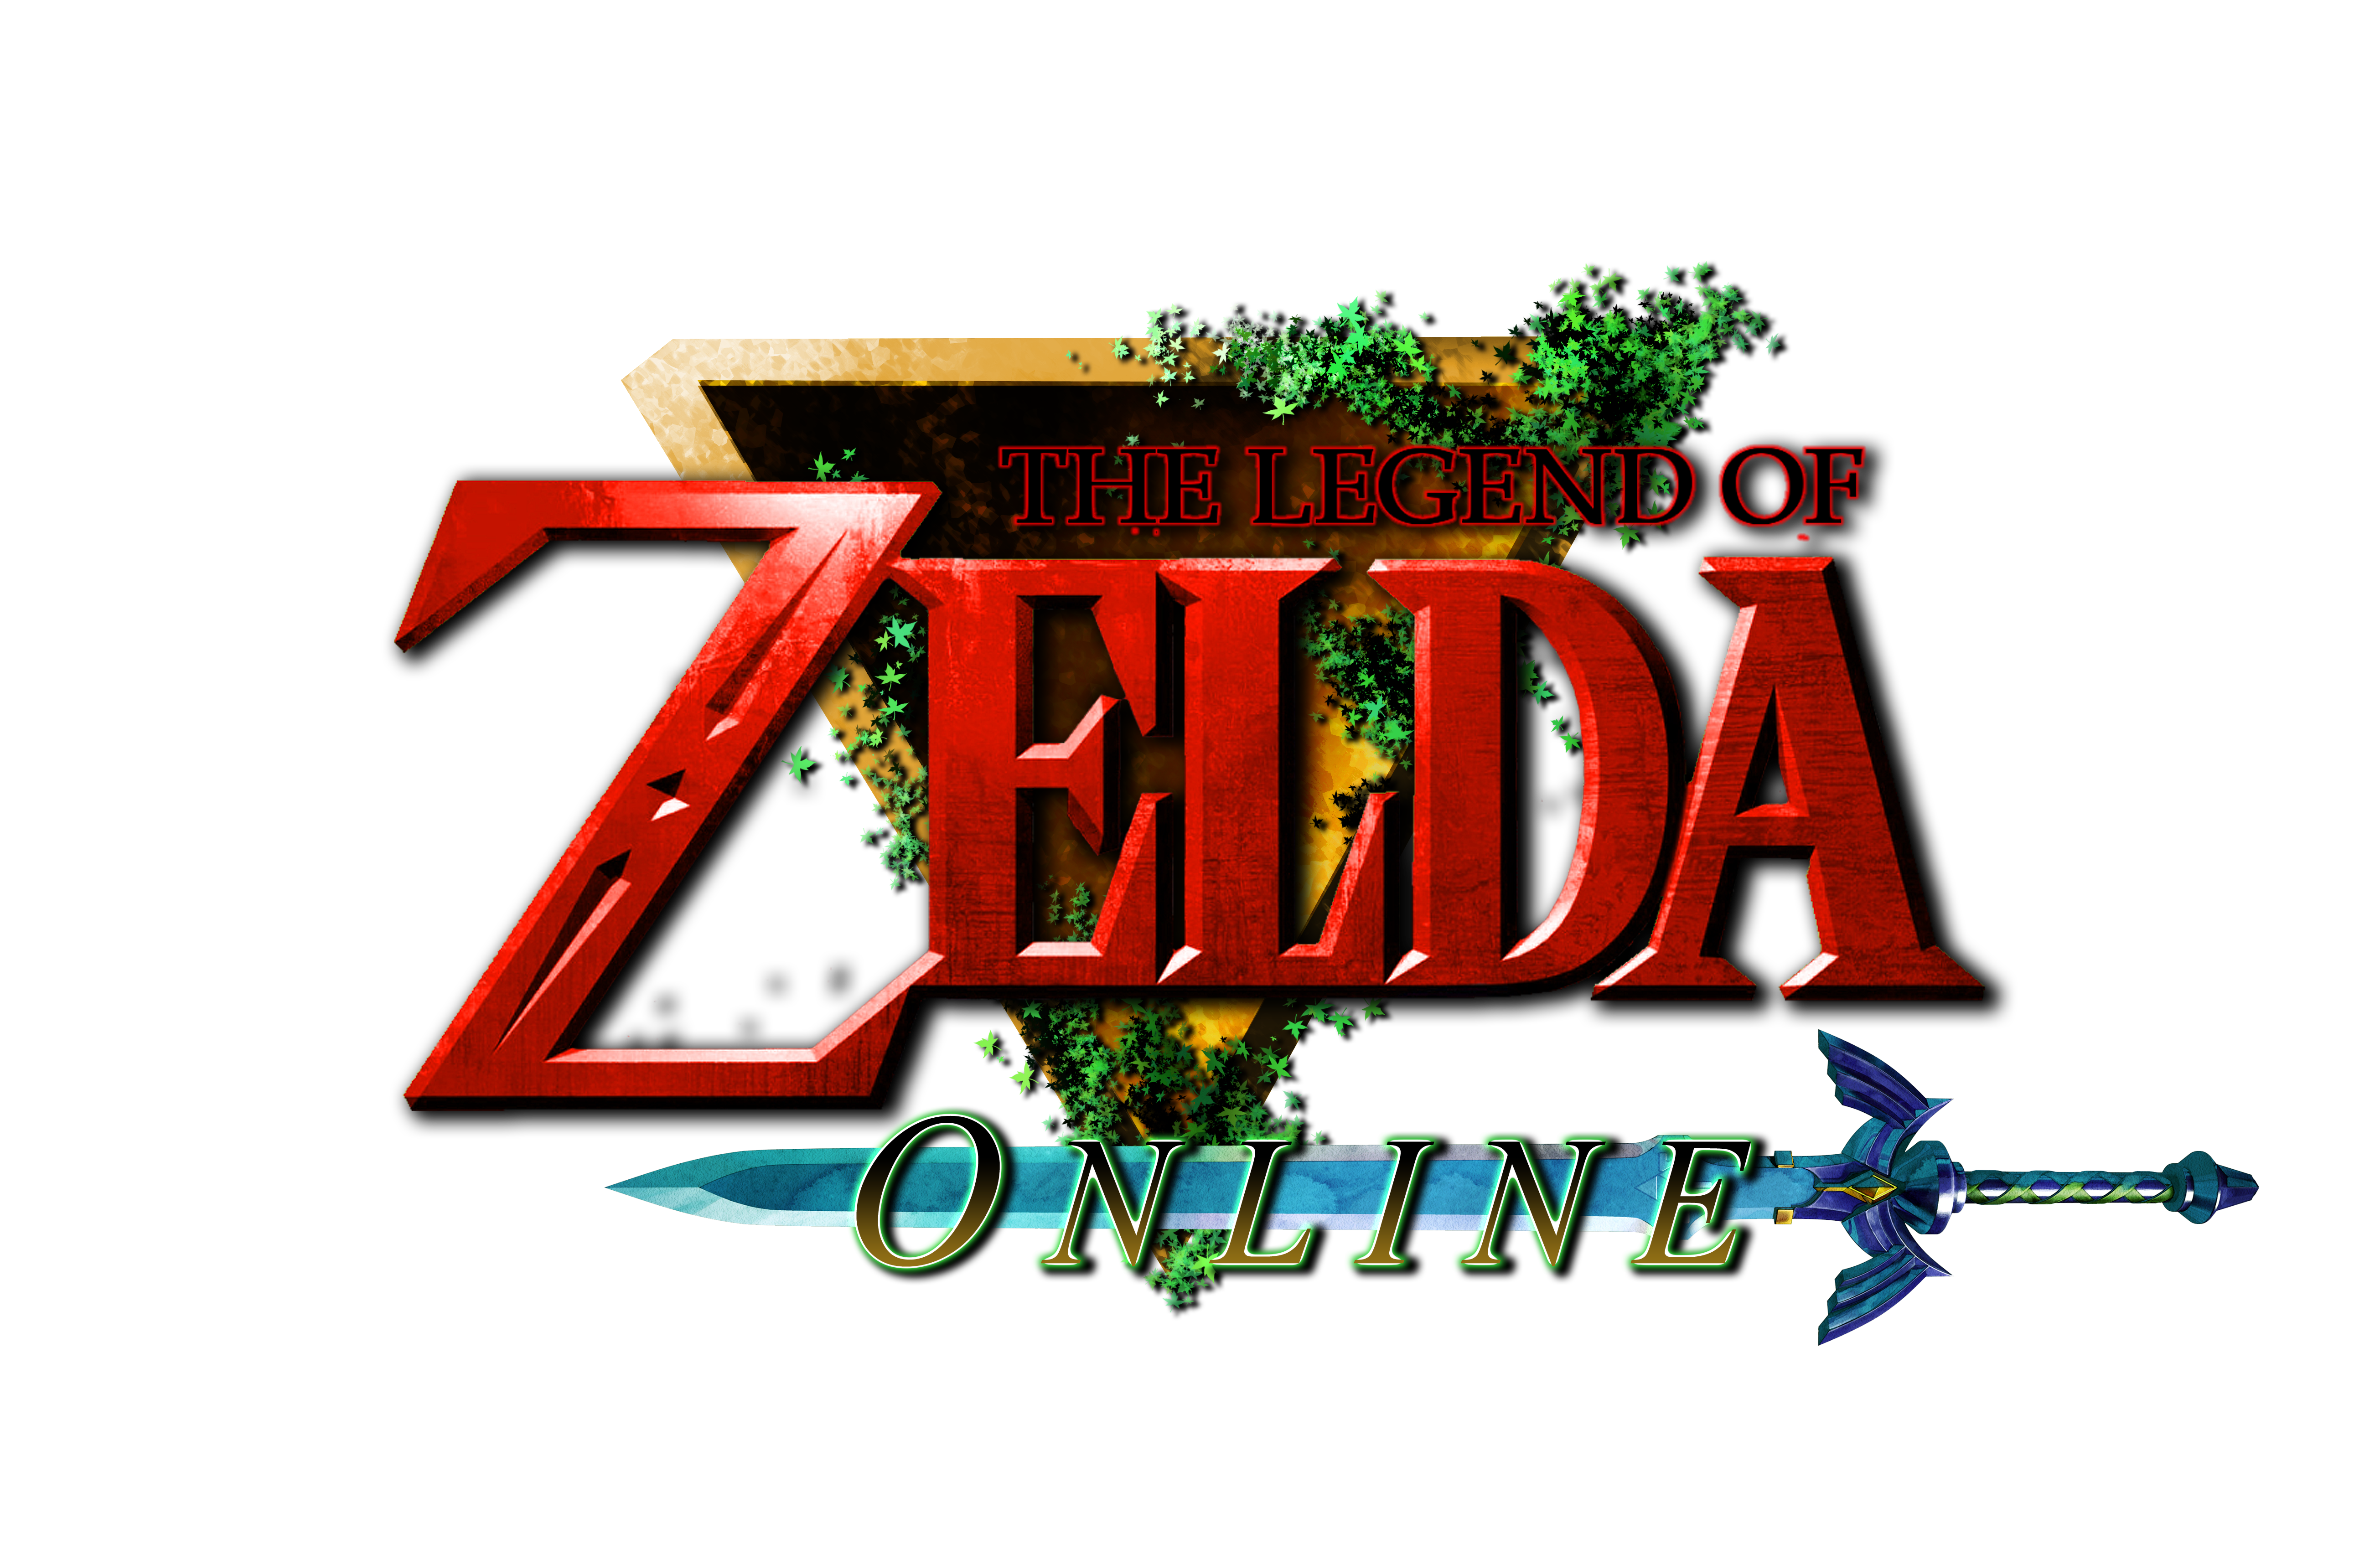 The Legend of Zelda ONLINE Logo by AzureParagon on DeviantArt